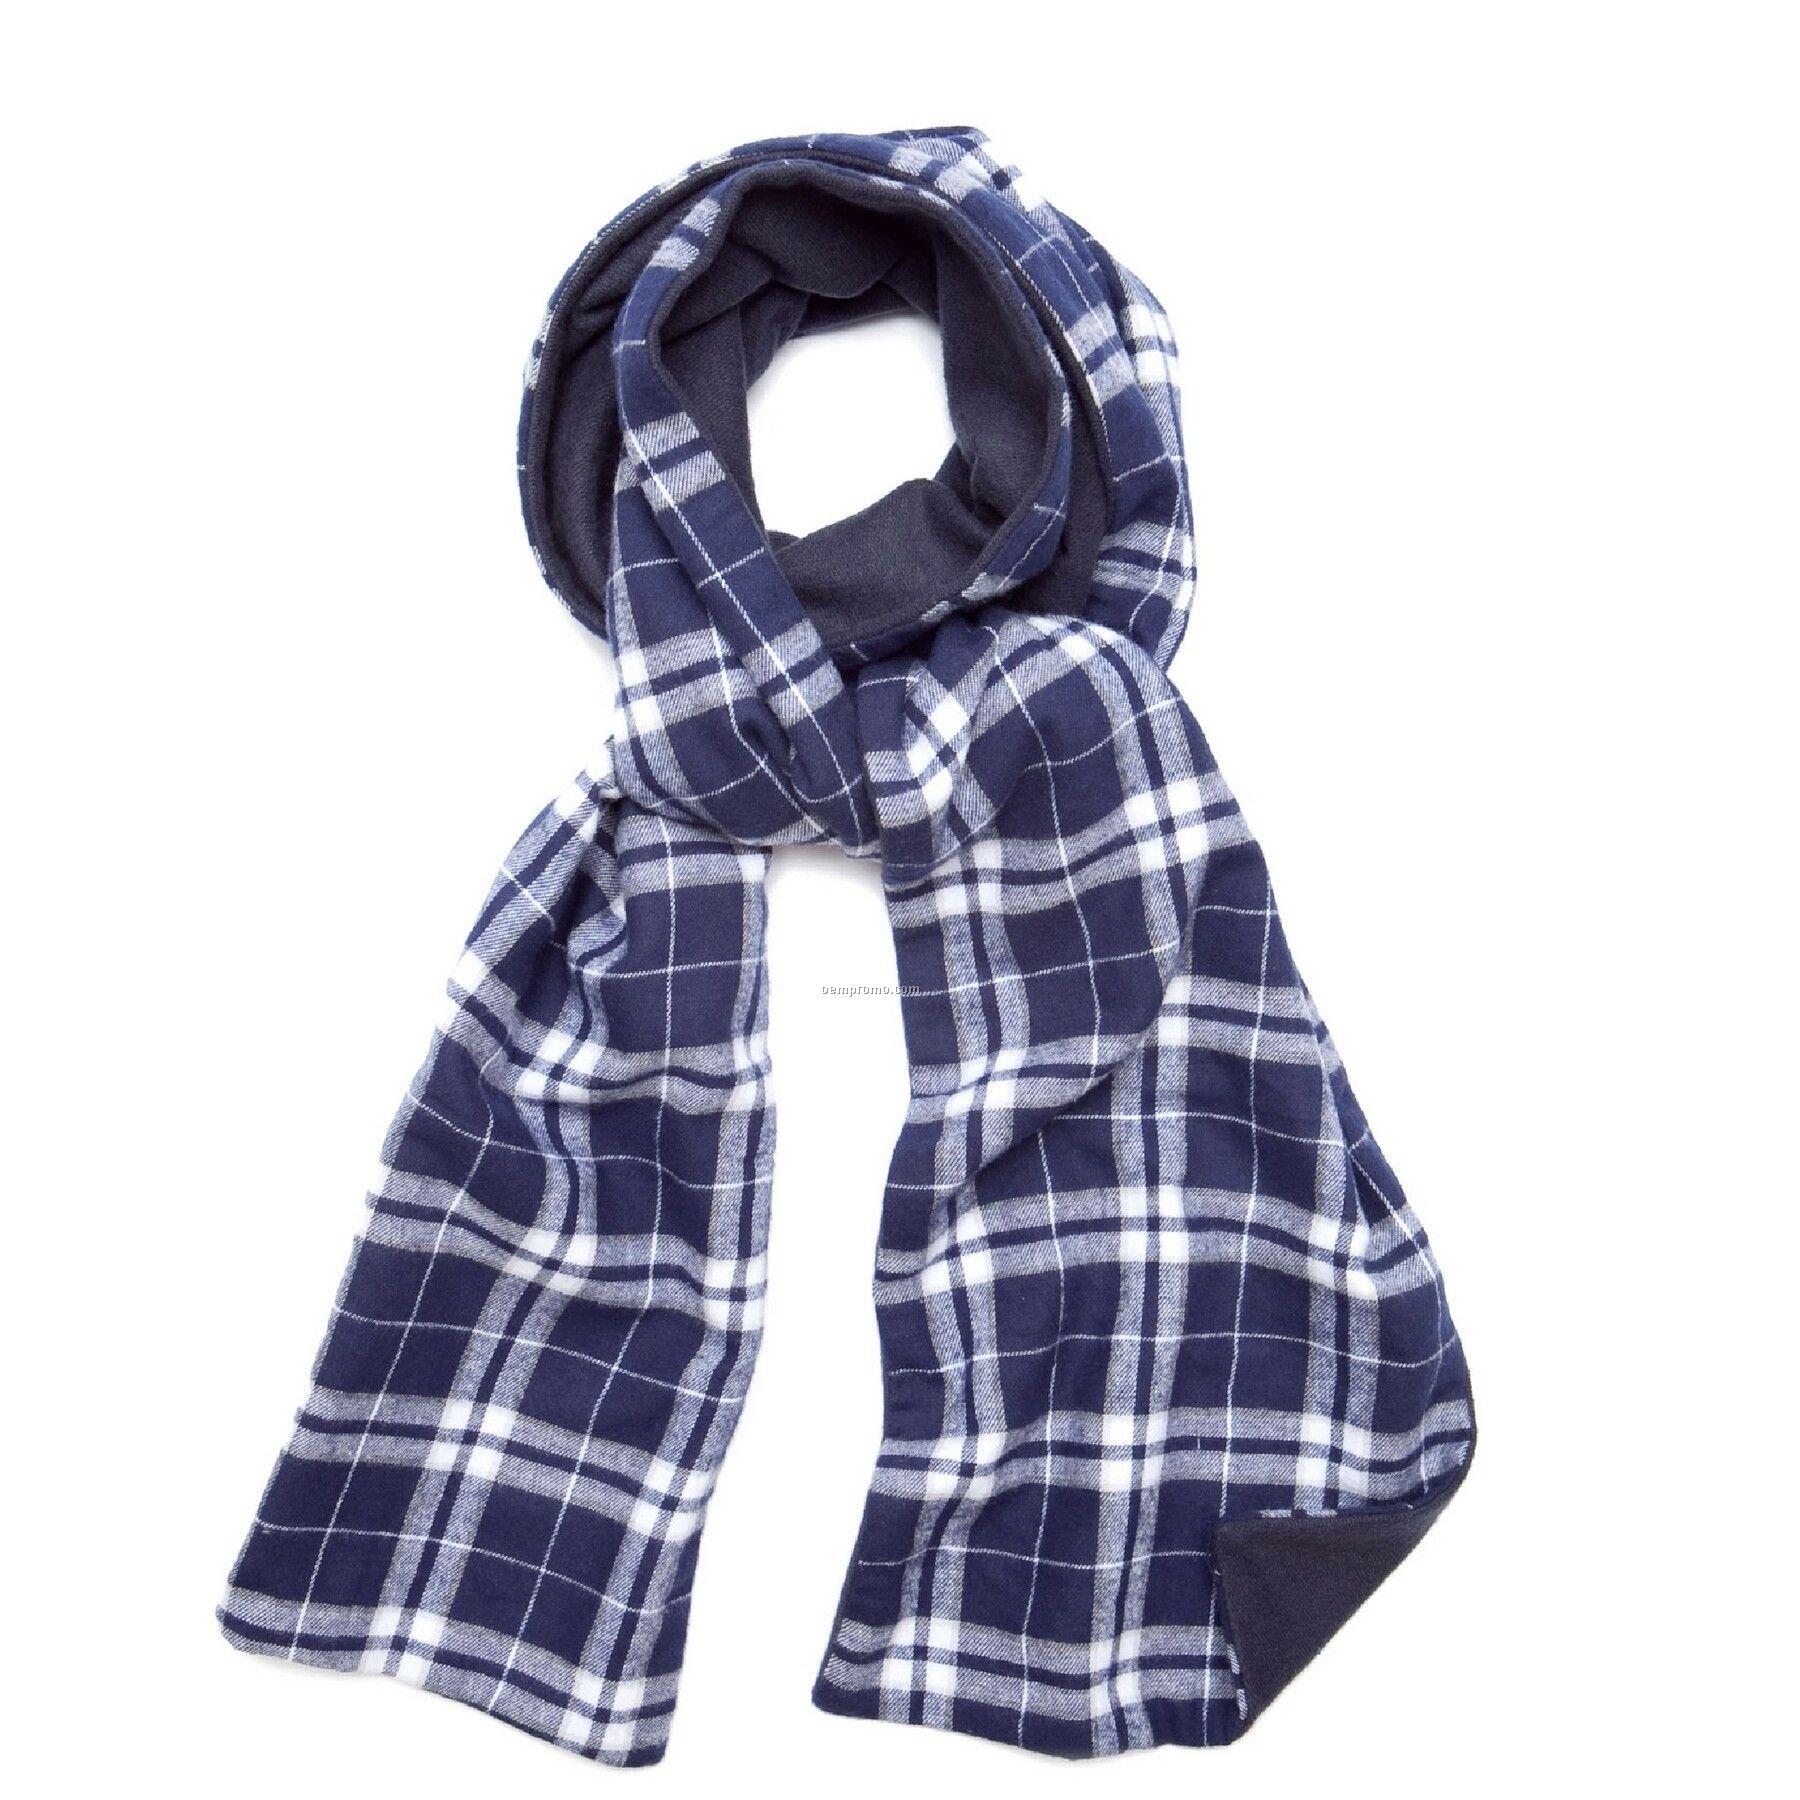 Navy Blue/Silver Flannel Scarf